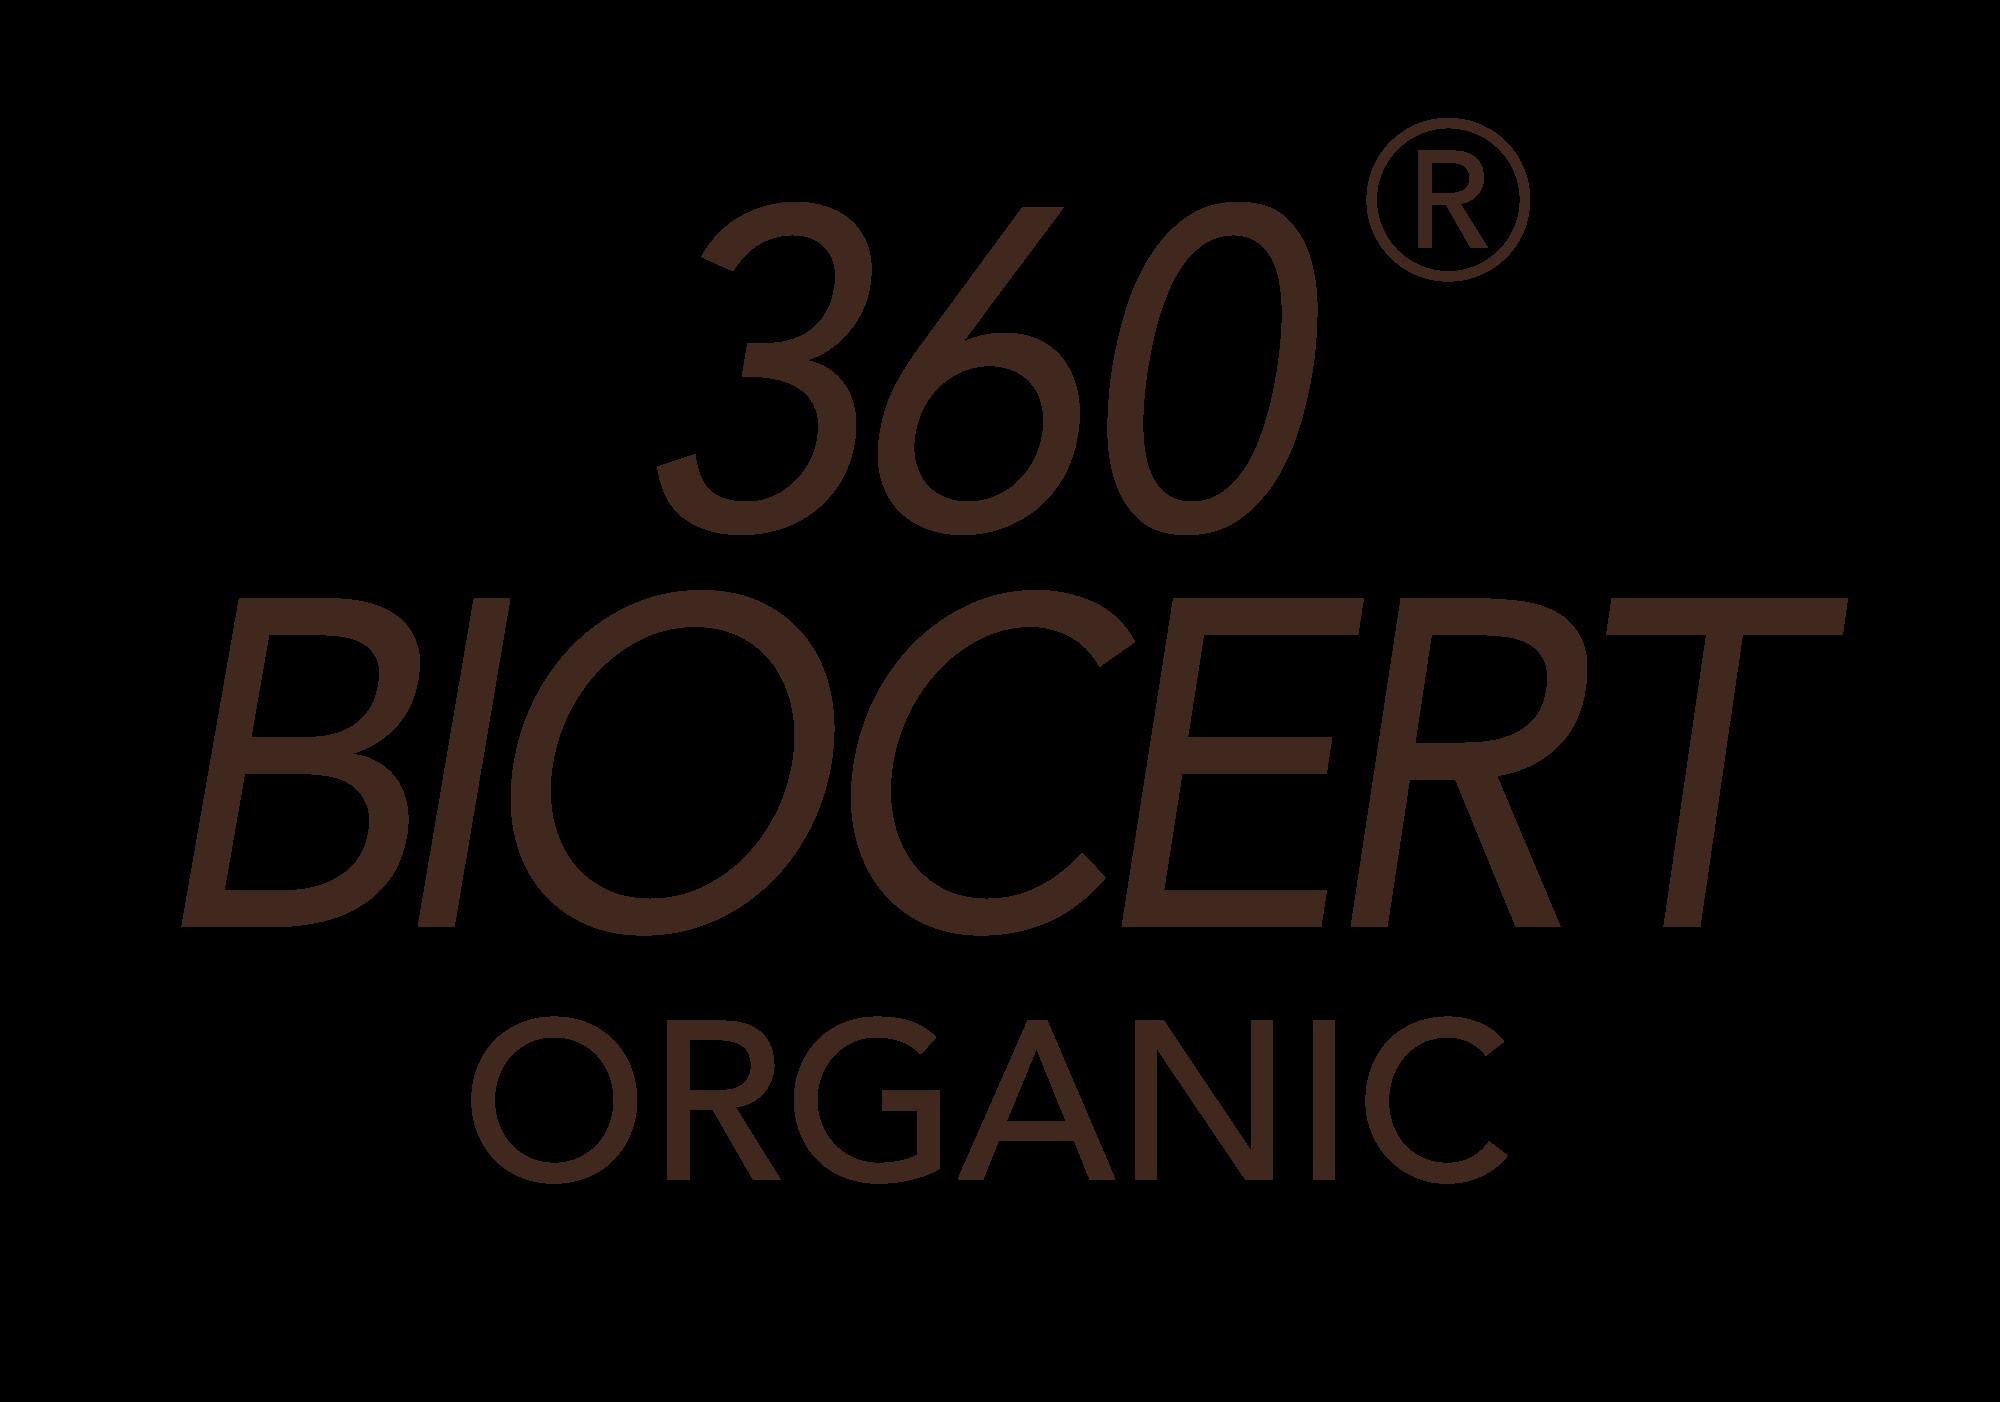 360 BIOCERT ORGANIC